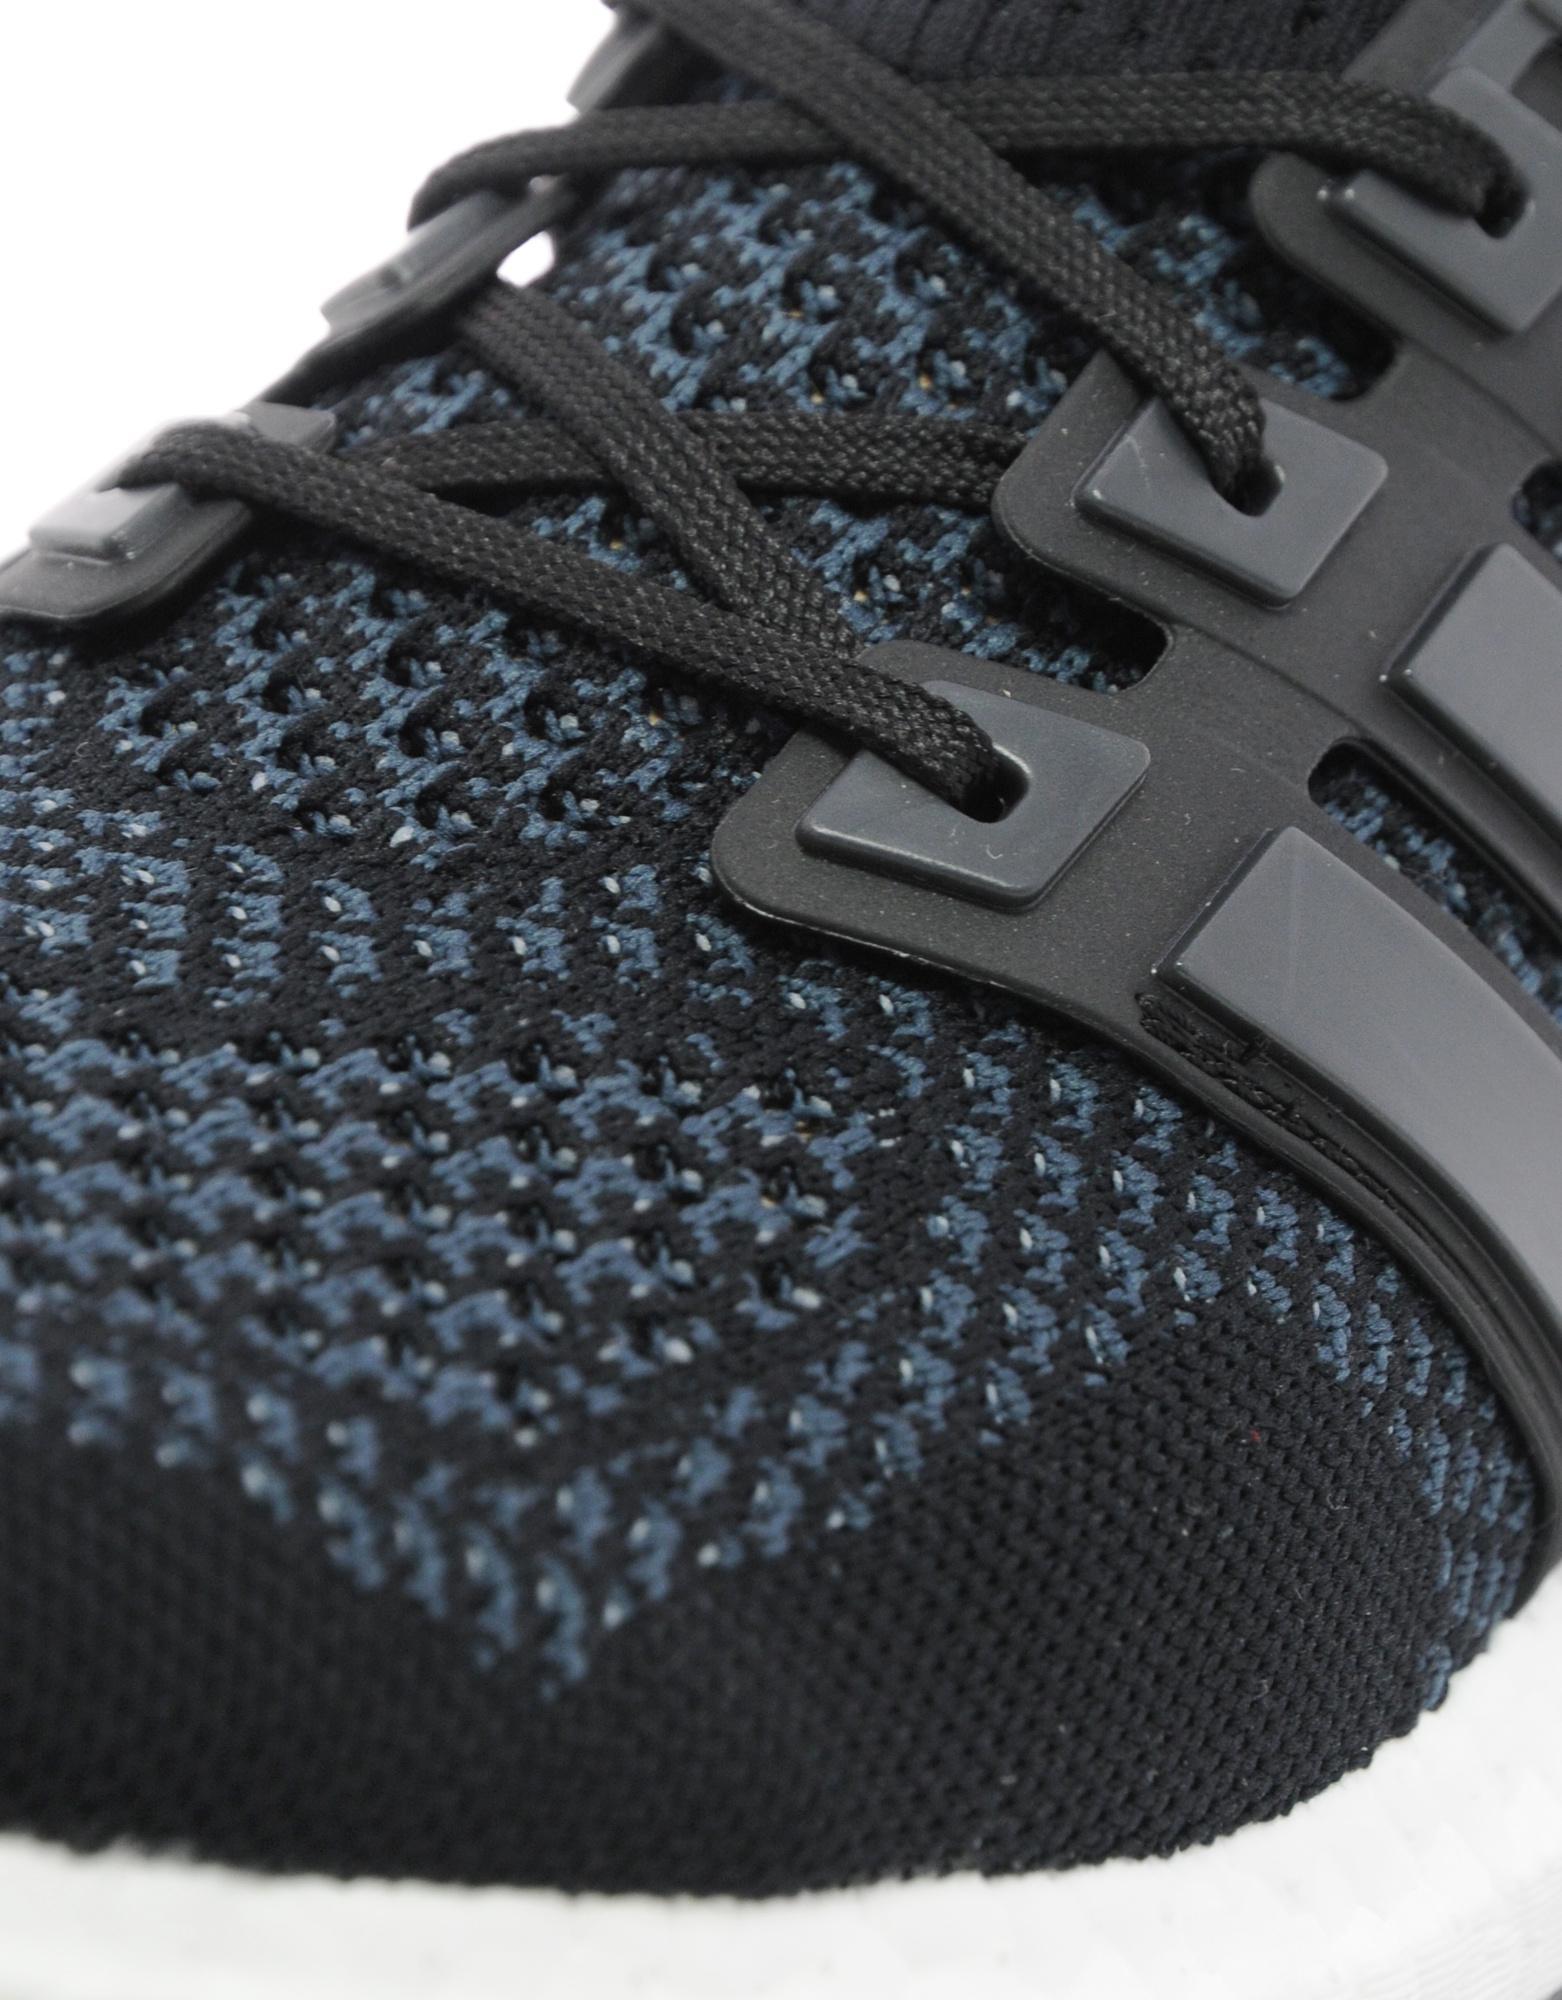 c4f3683616a4 australia adidas energy boost esm mens running shoes side a46b7 792e5   ireland adidas ultra boost 12.5 men . 3f8d8 6cbb0